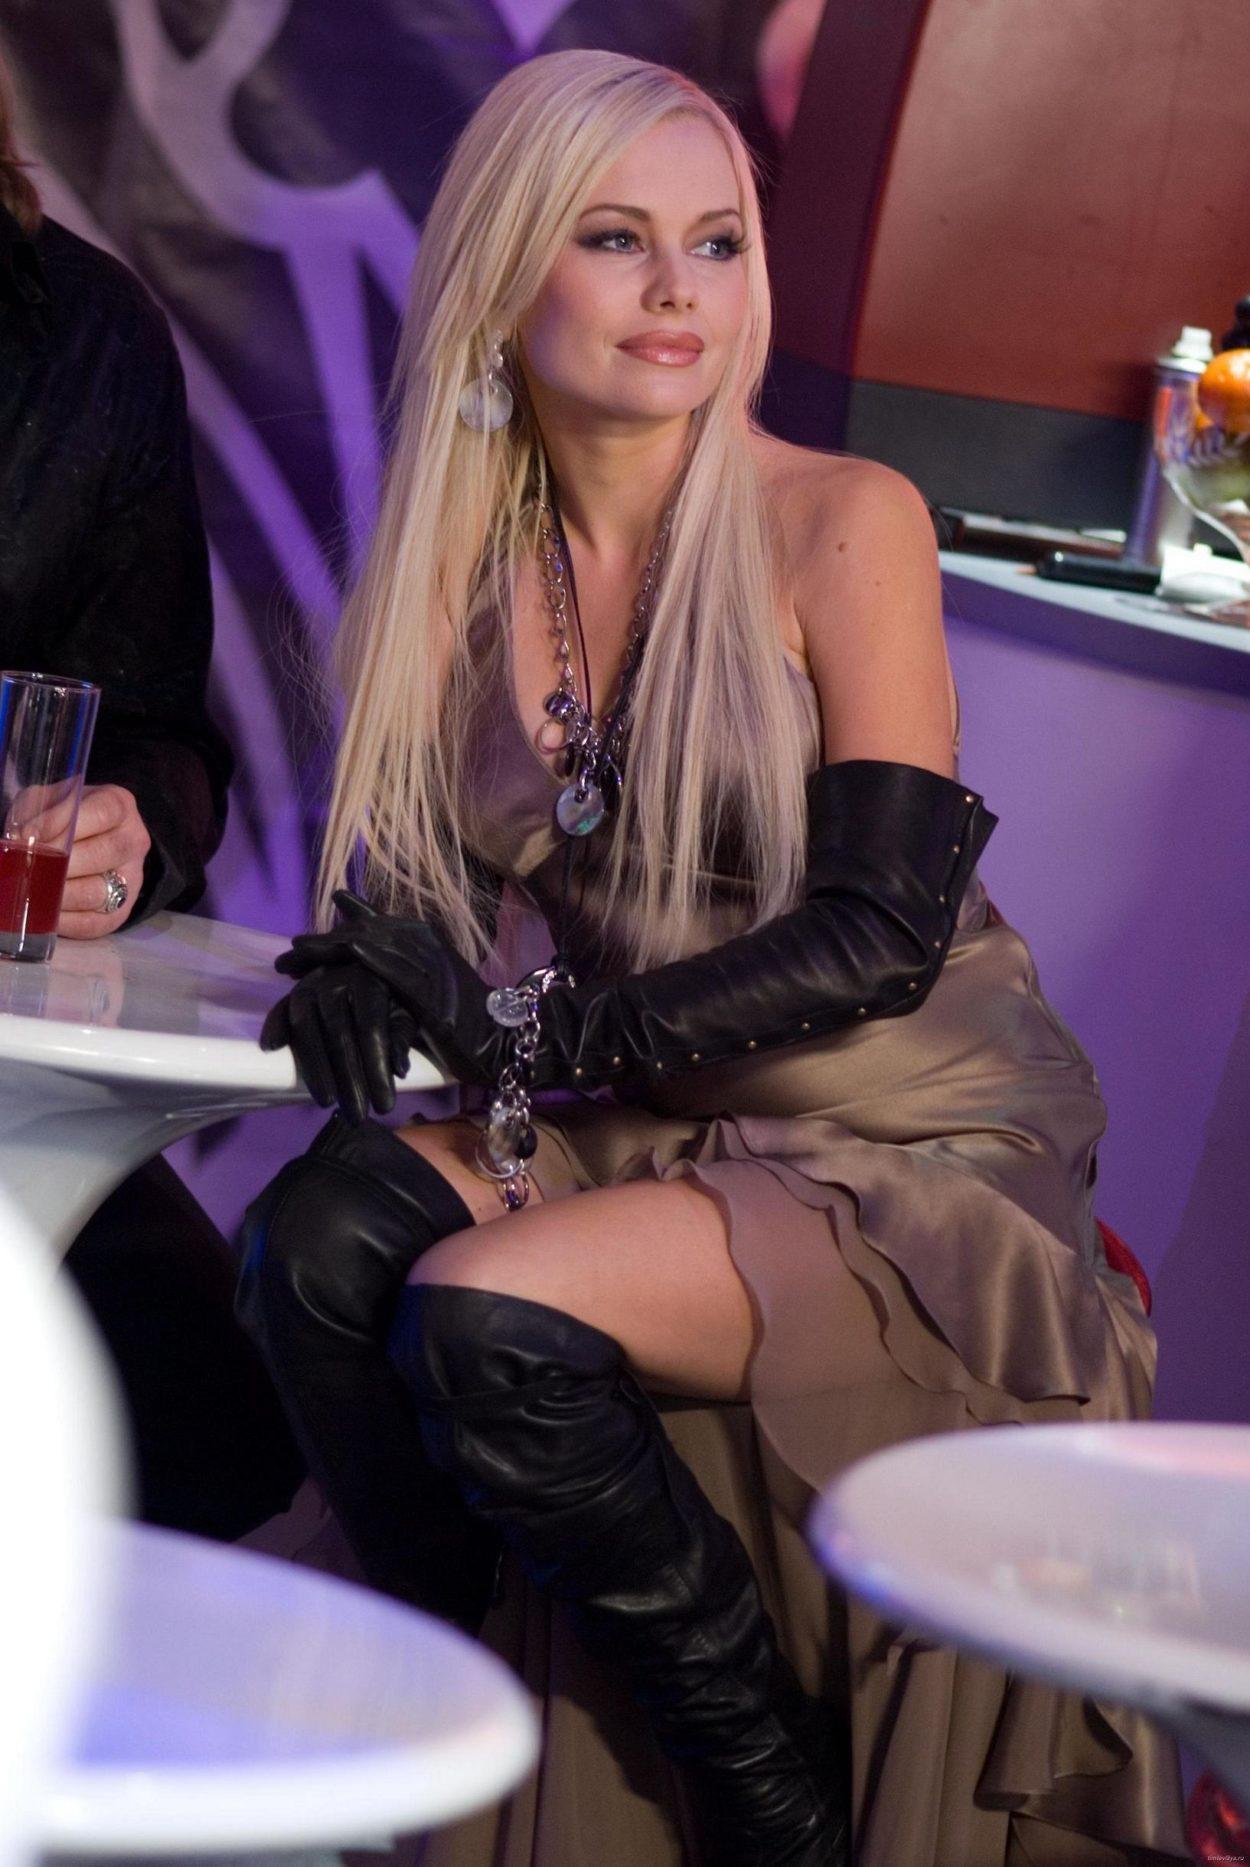 Елена Корикова — куда пропала любимица публики «Бедная Настя»?